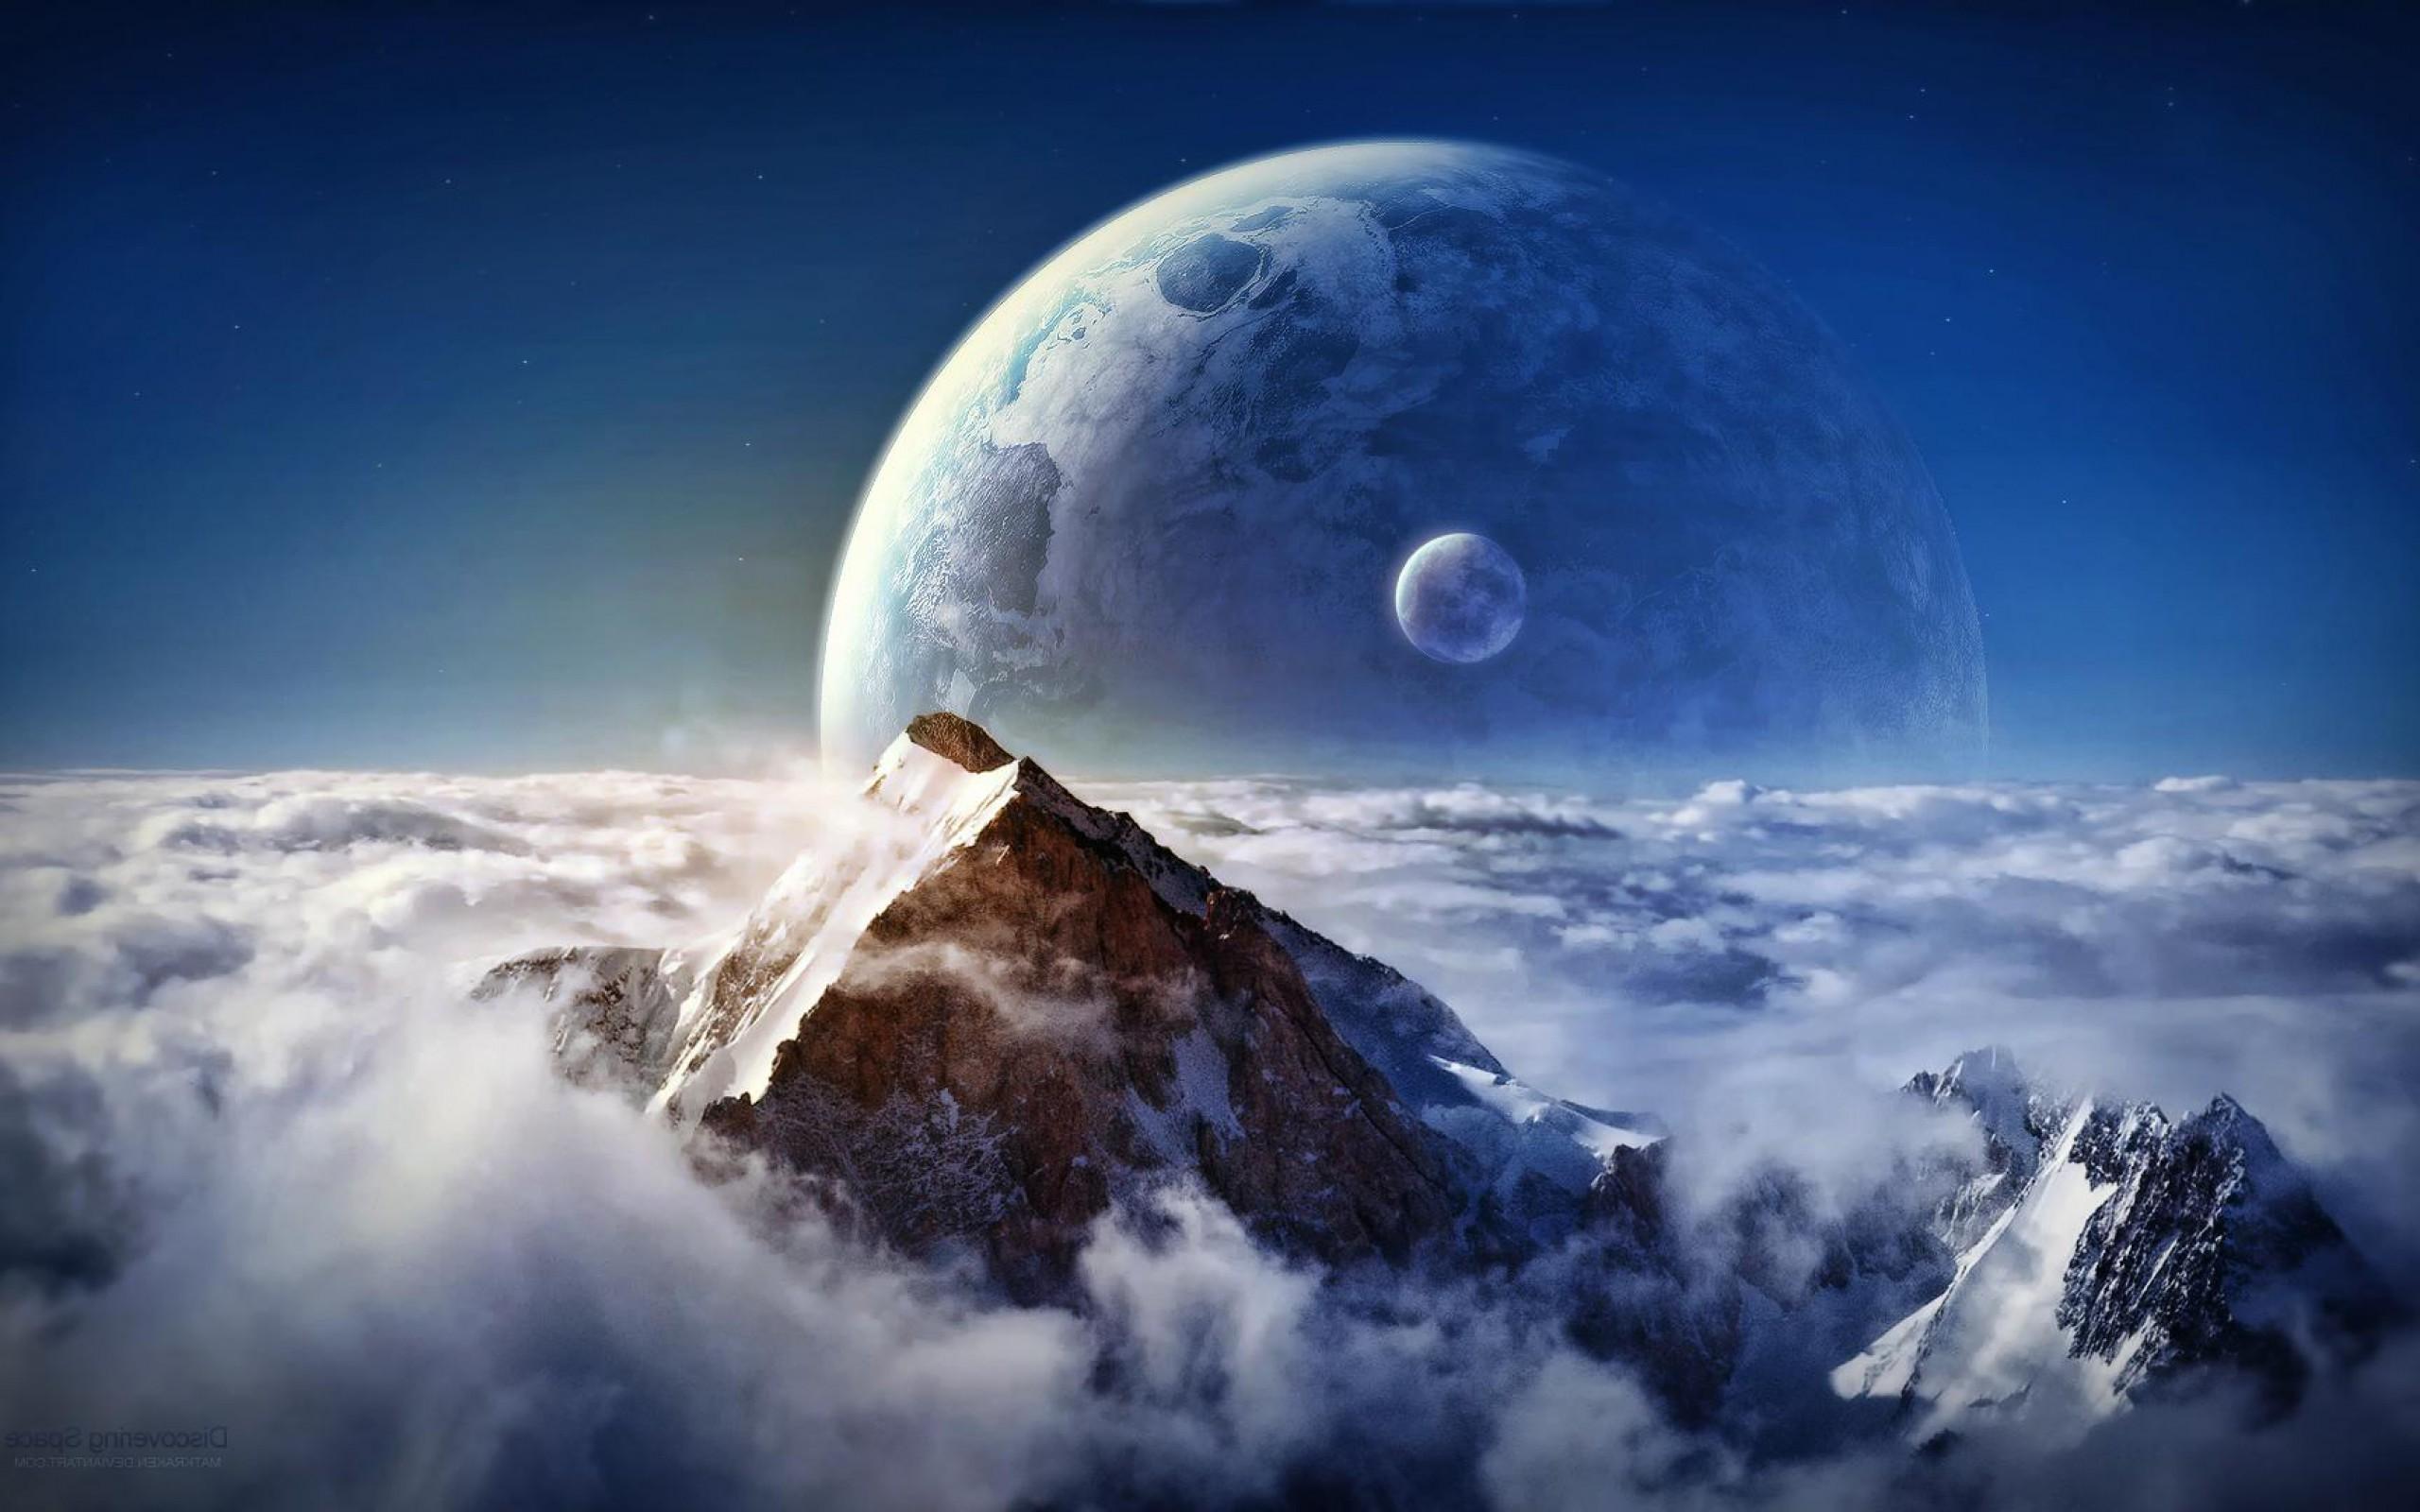 Hd Fantasy Wallpapers To Inspire Your Desktop: Sci Fi Landscape Wallpaper HD